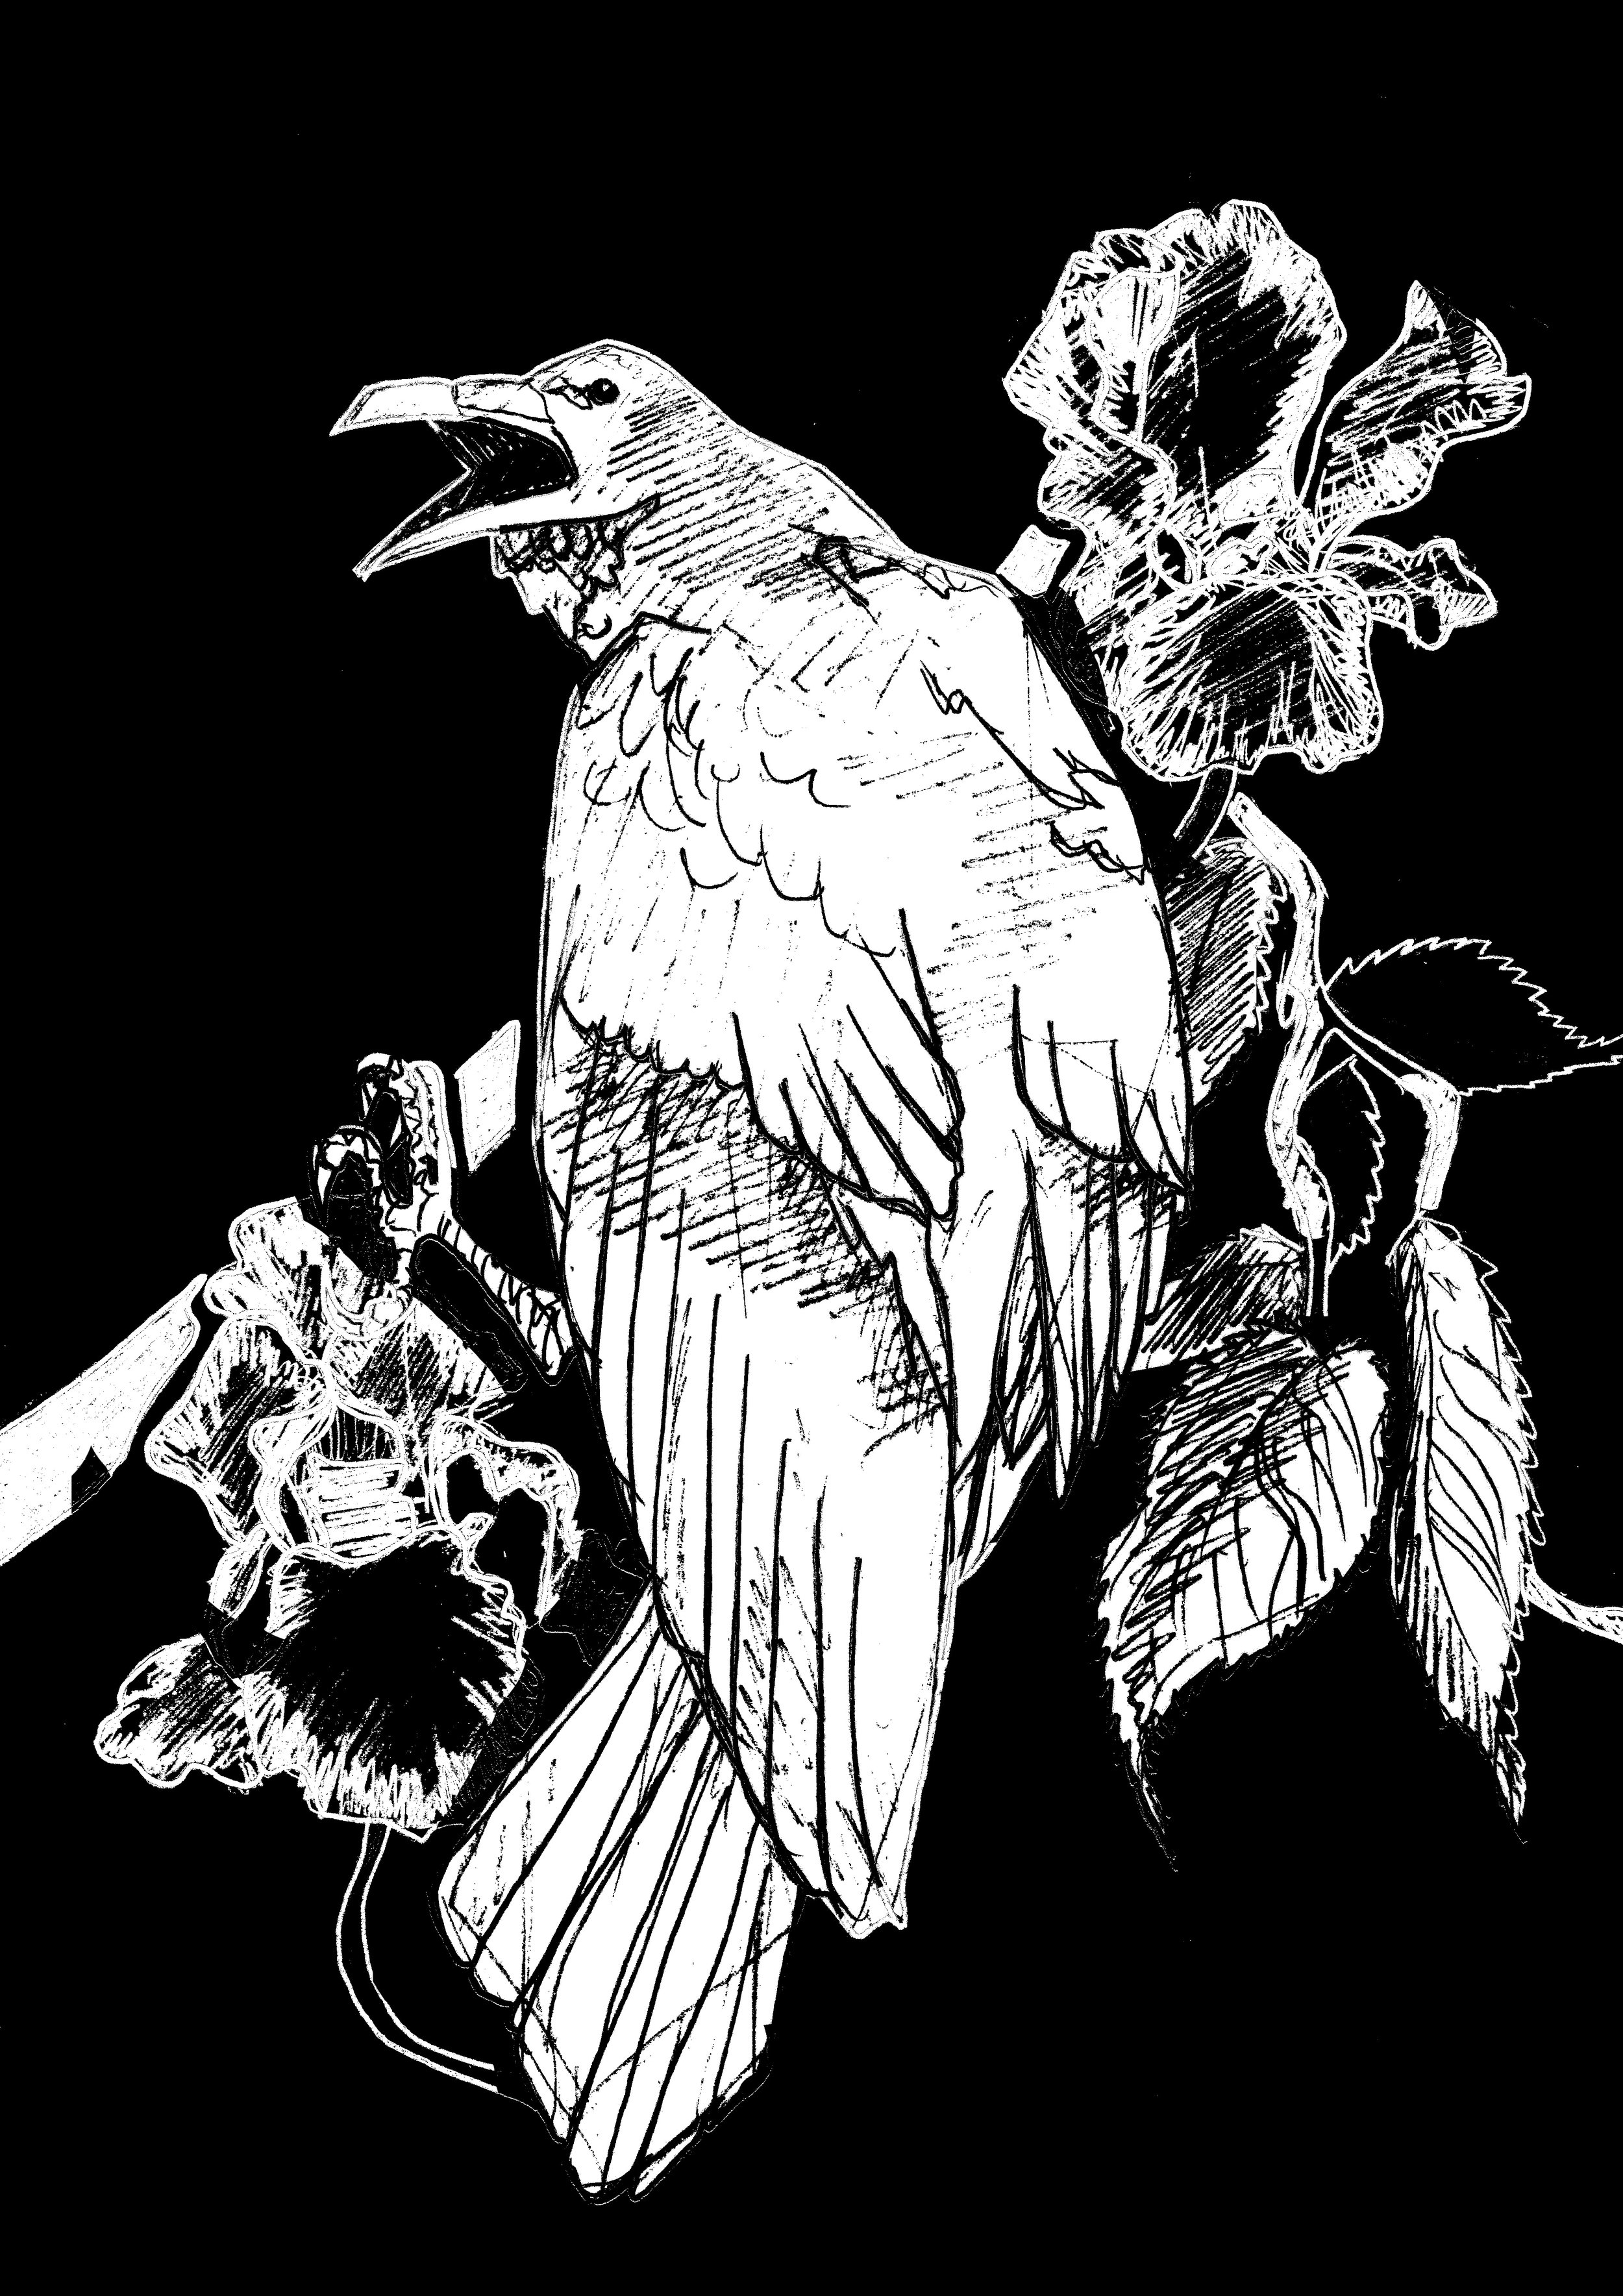 2 raven - kopia.jpg